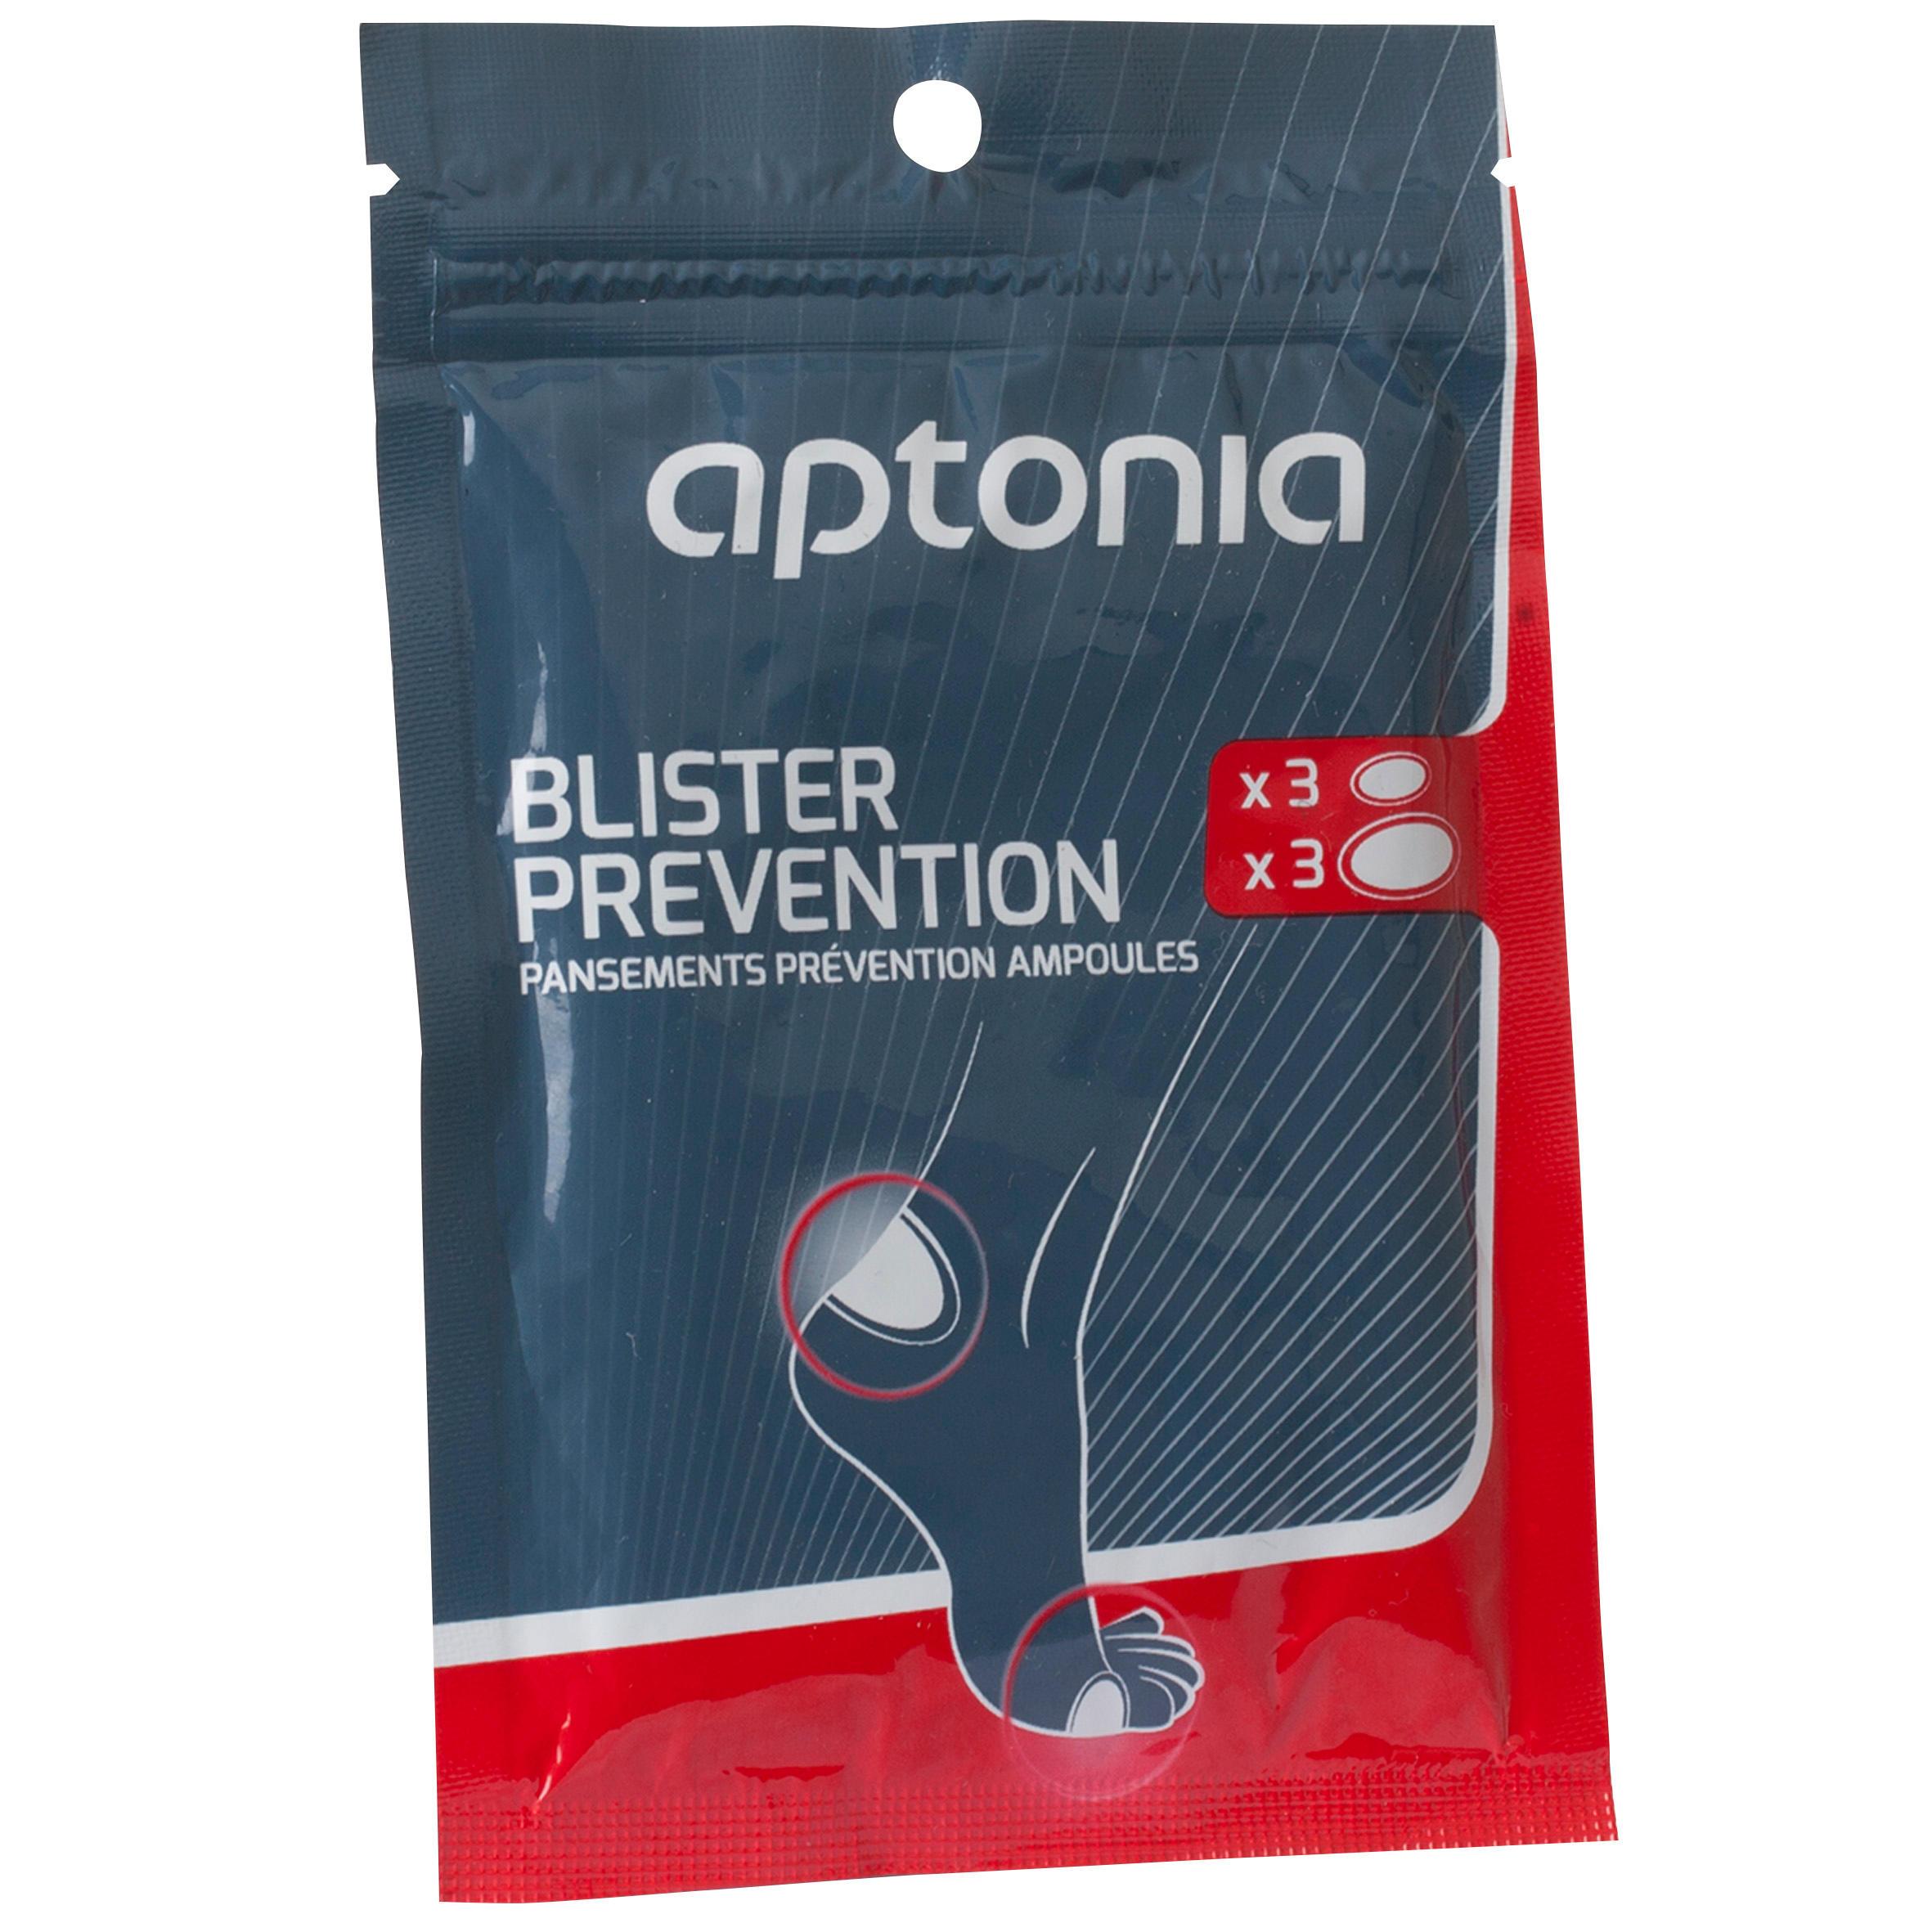 Blister plasters x6